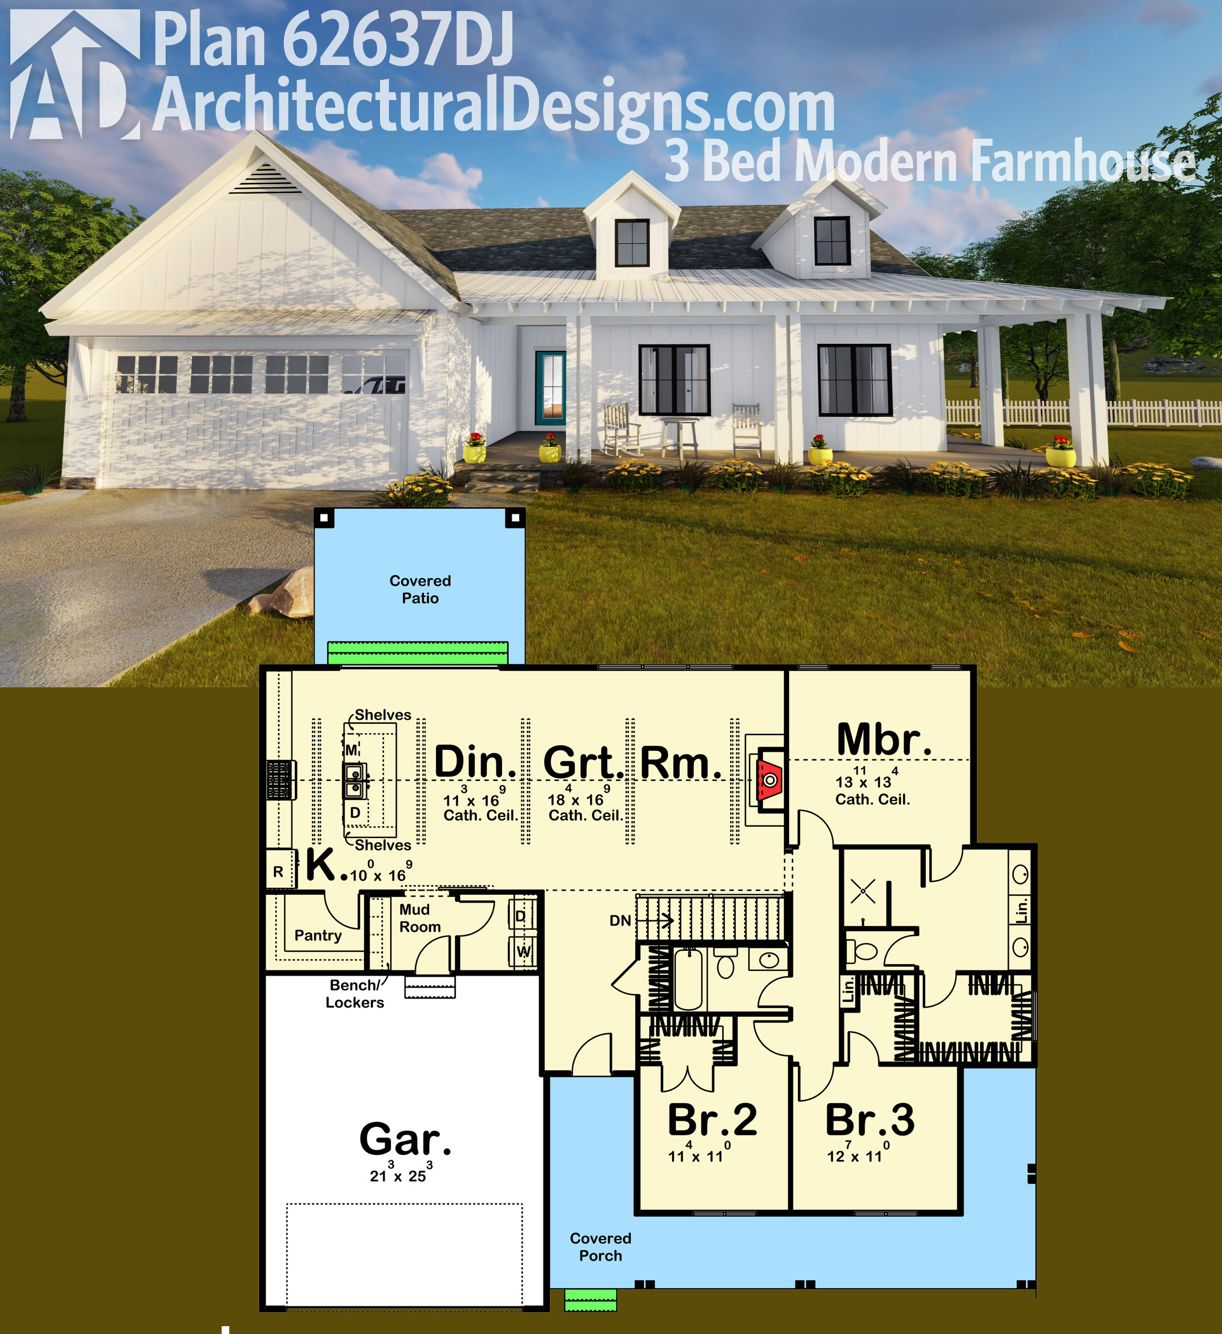 architectural designs 3 bed modern farmhouse plan 62637dj almost